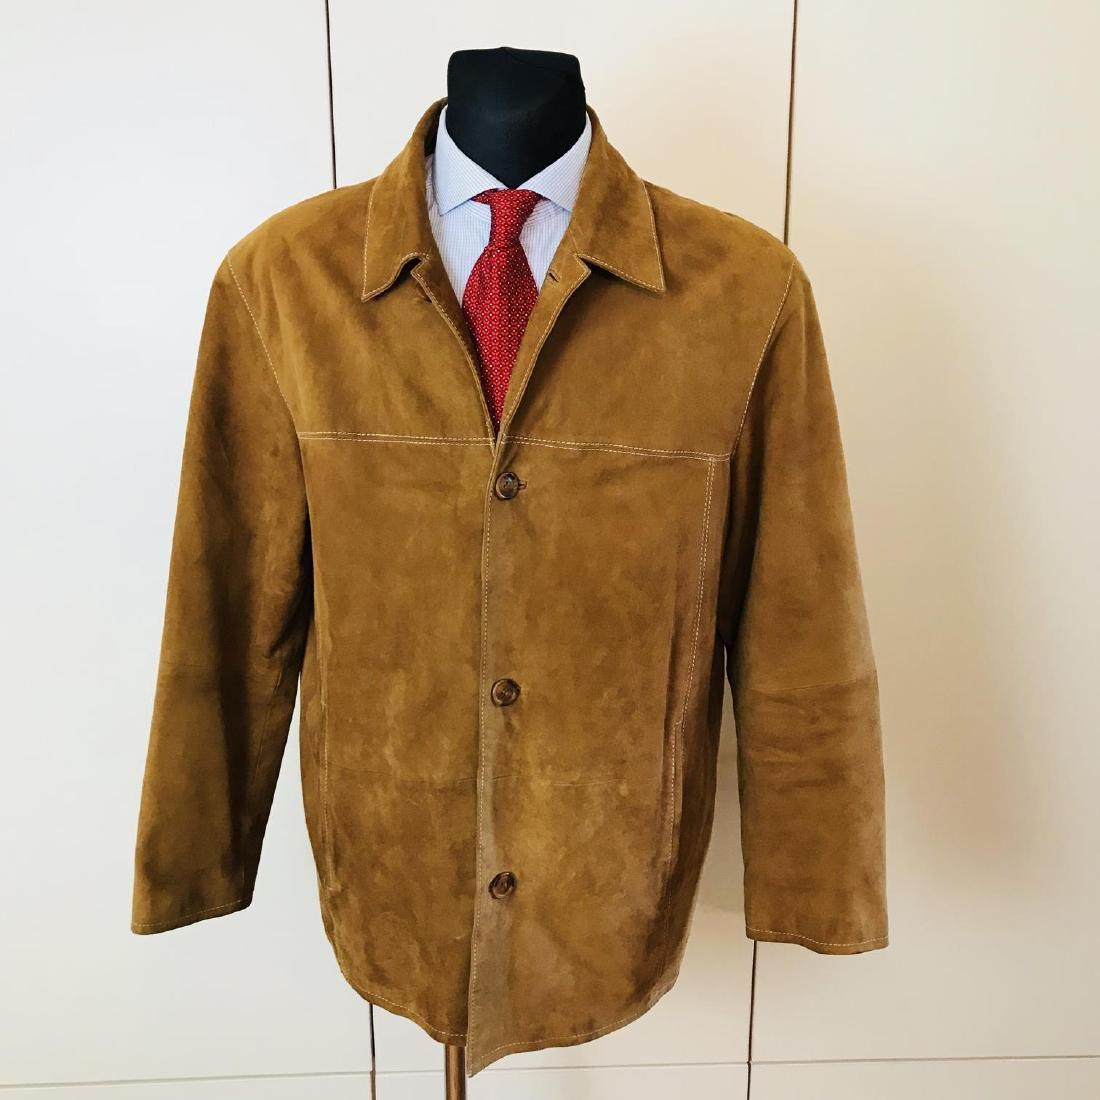 Vintage Men's Brown Suede Leather Jacket Coat Size 40